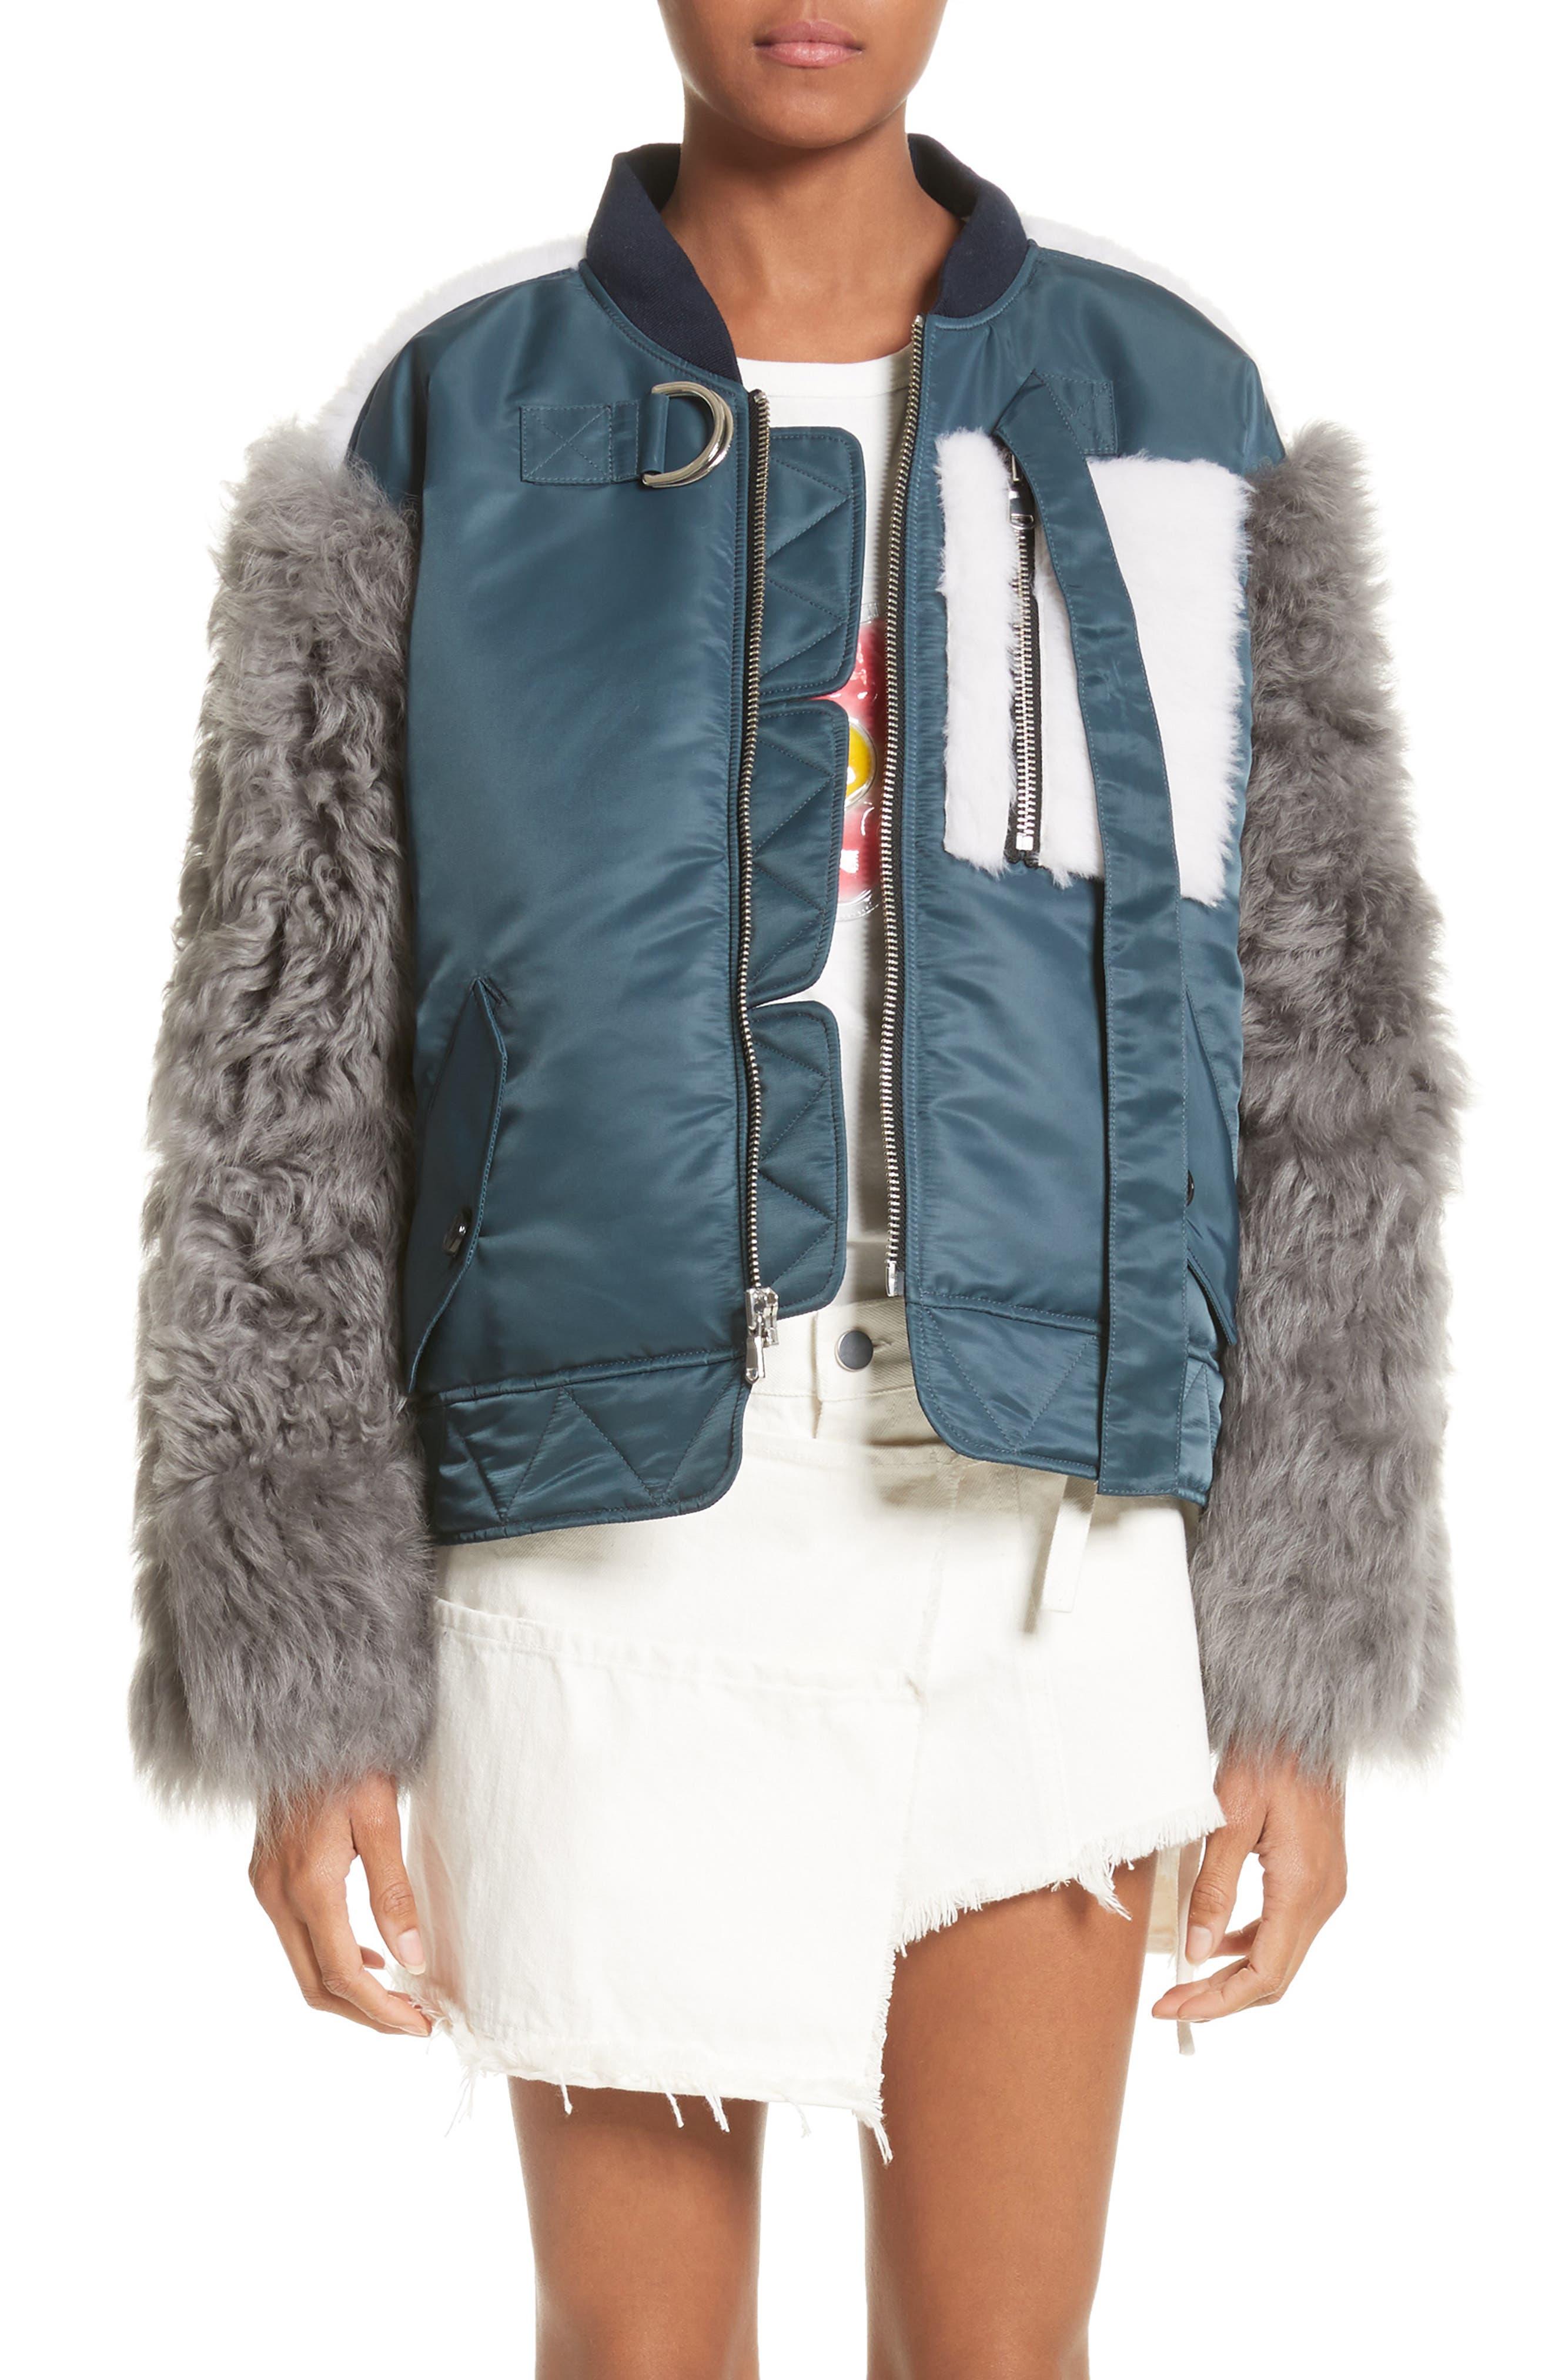 Peter Genuine Shearling Sleeve Jacket,                             Main thumbnail 1, color,                             410